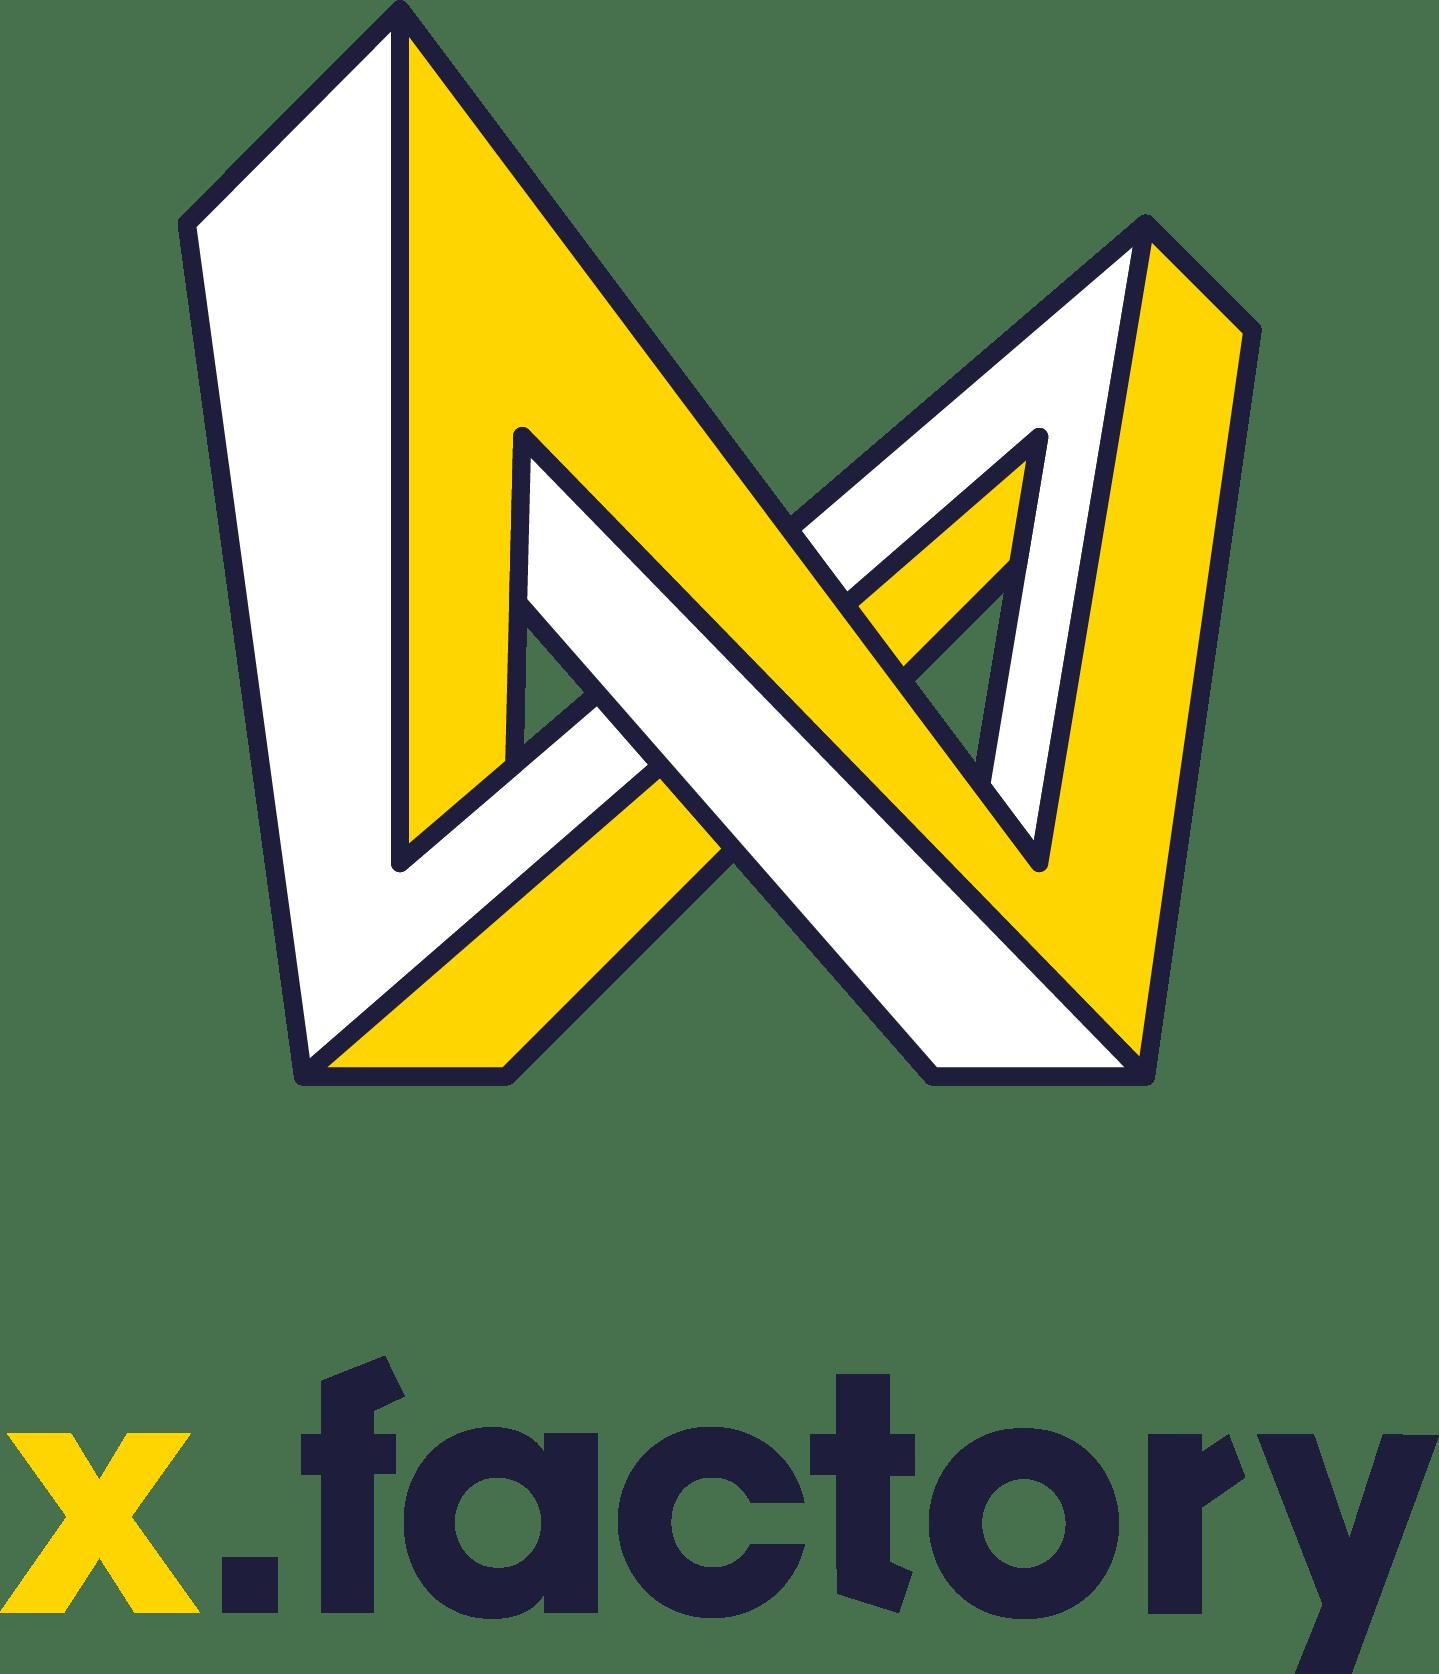 X factory logo nbnceps36p